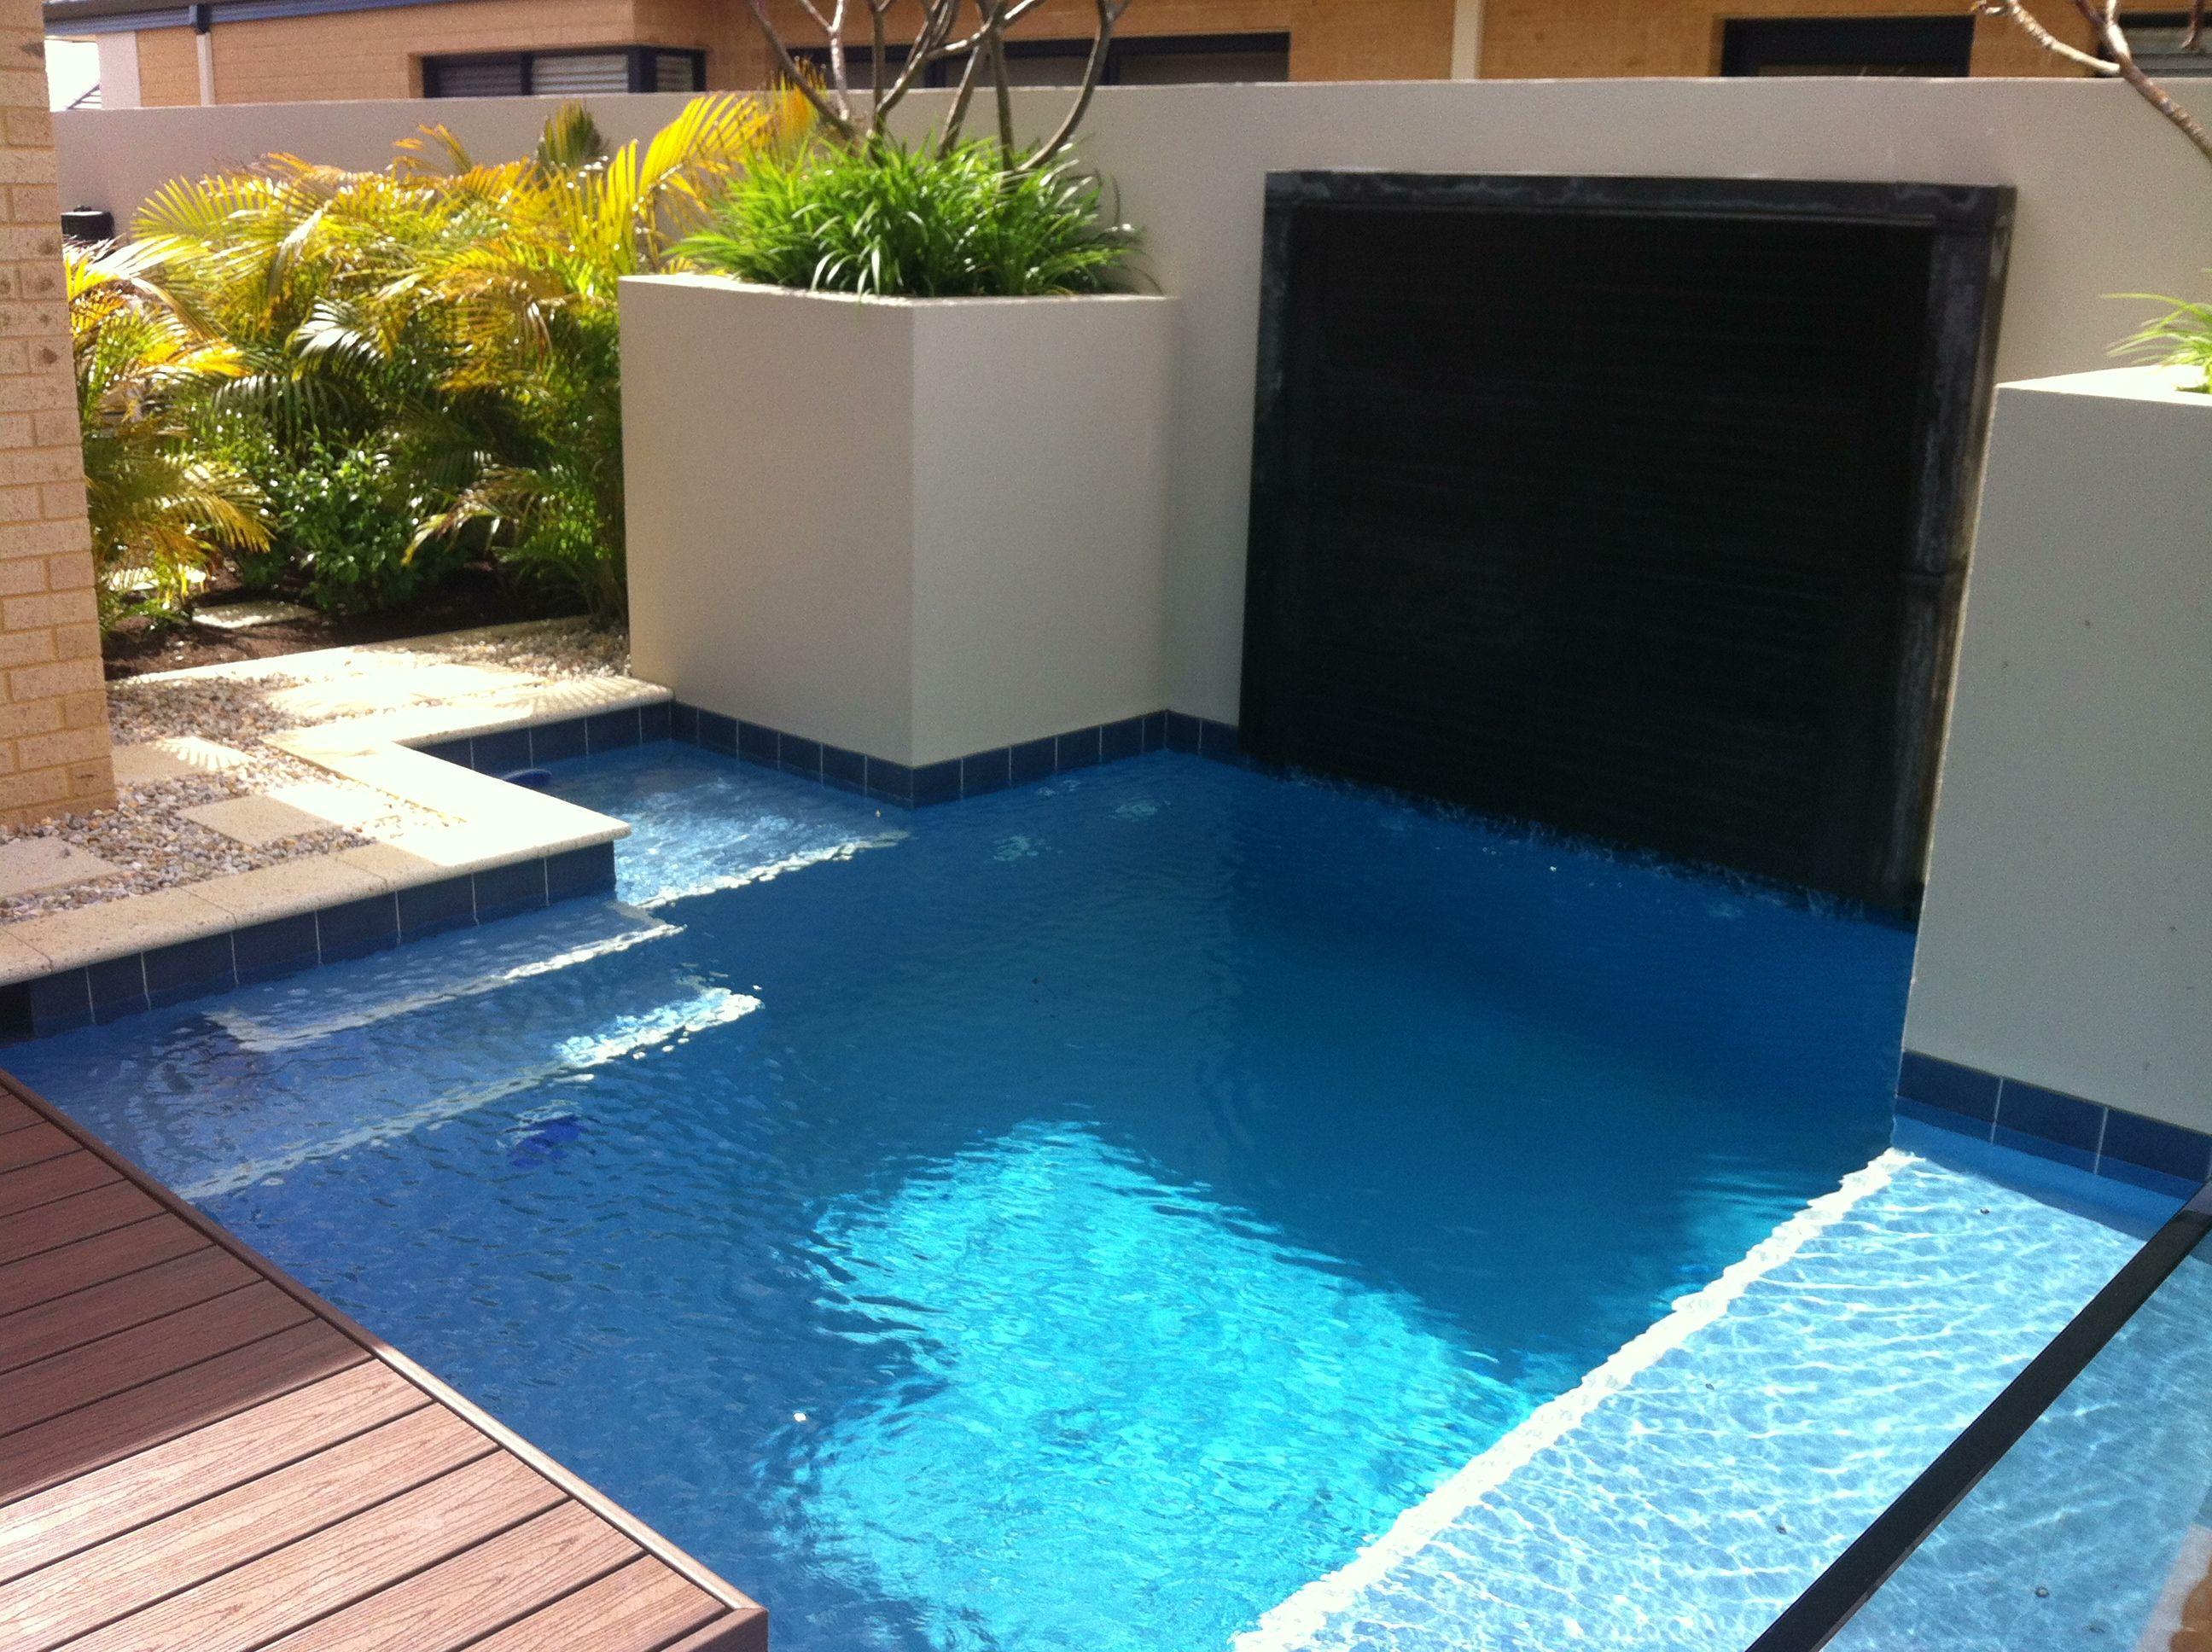 Plunge pool pools pinterest for Plunge pool design